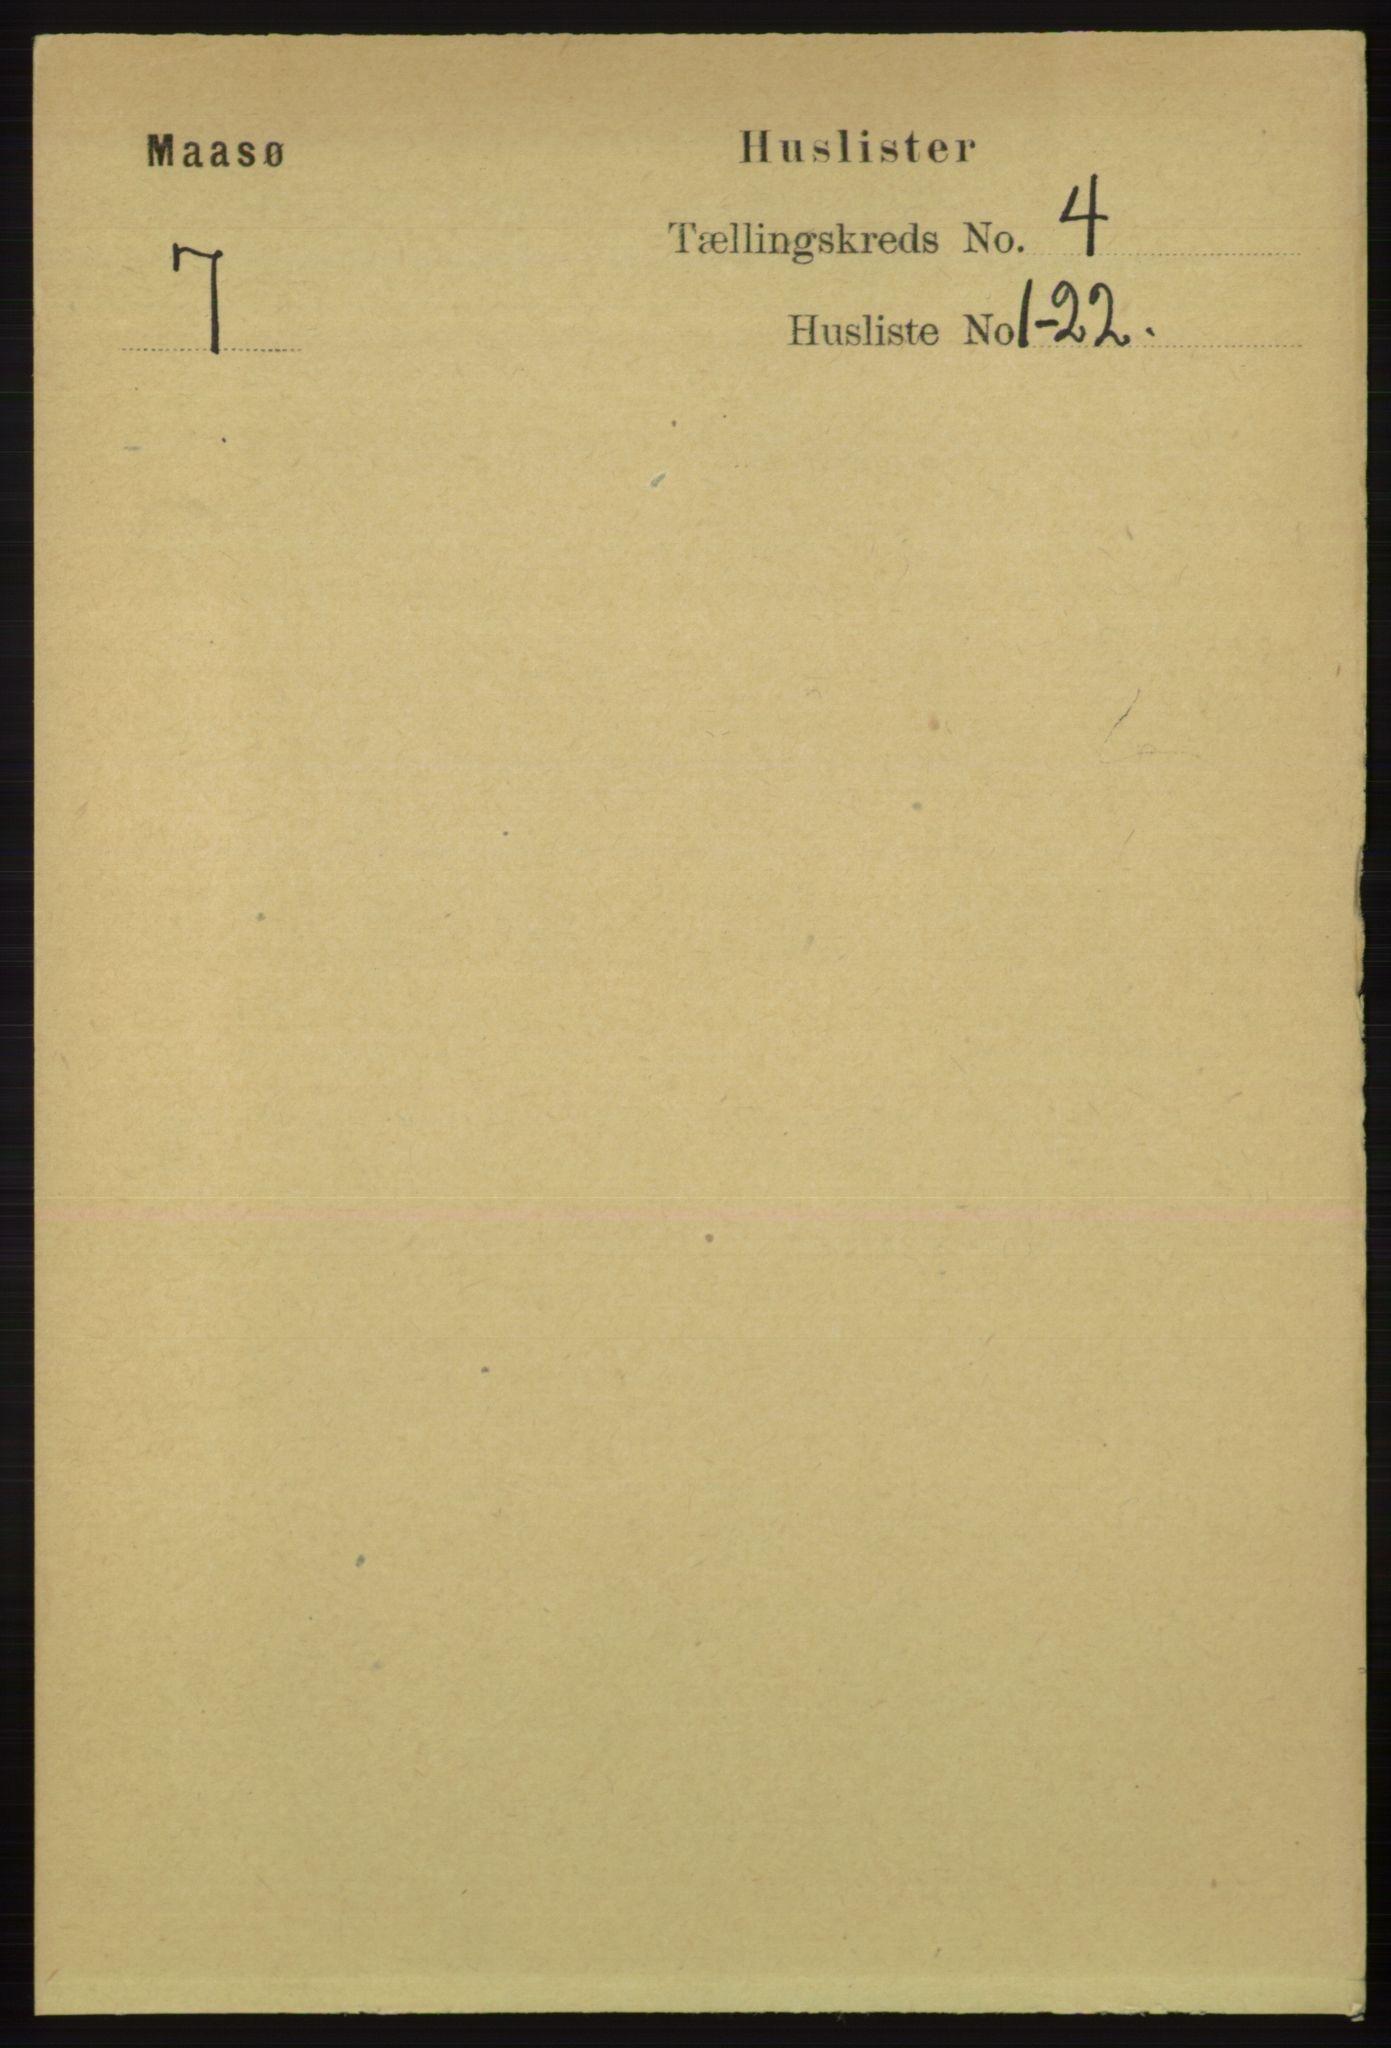 RA, Folketelling 1891 for 2018 Måsøy herred, 1891, s. 506